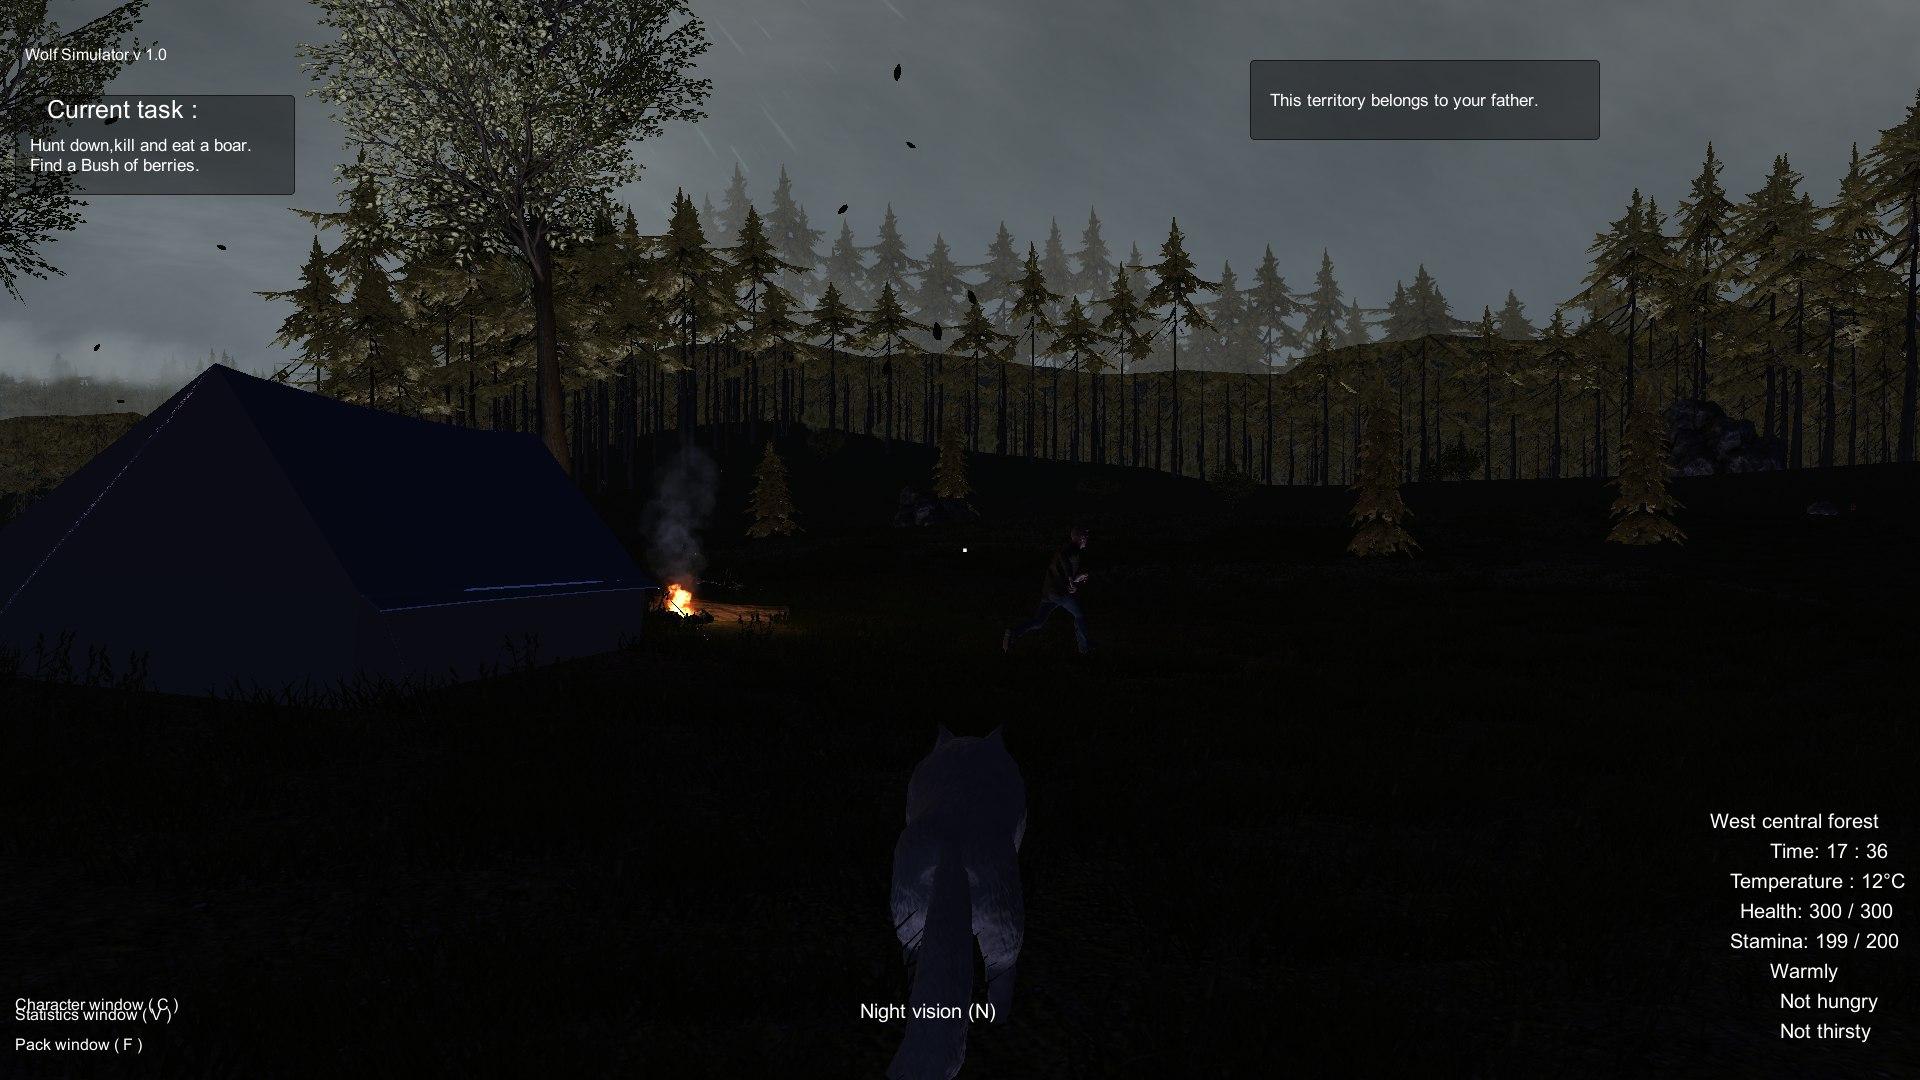 Wolf Simulator Screenshot 1